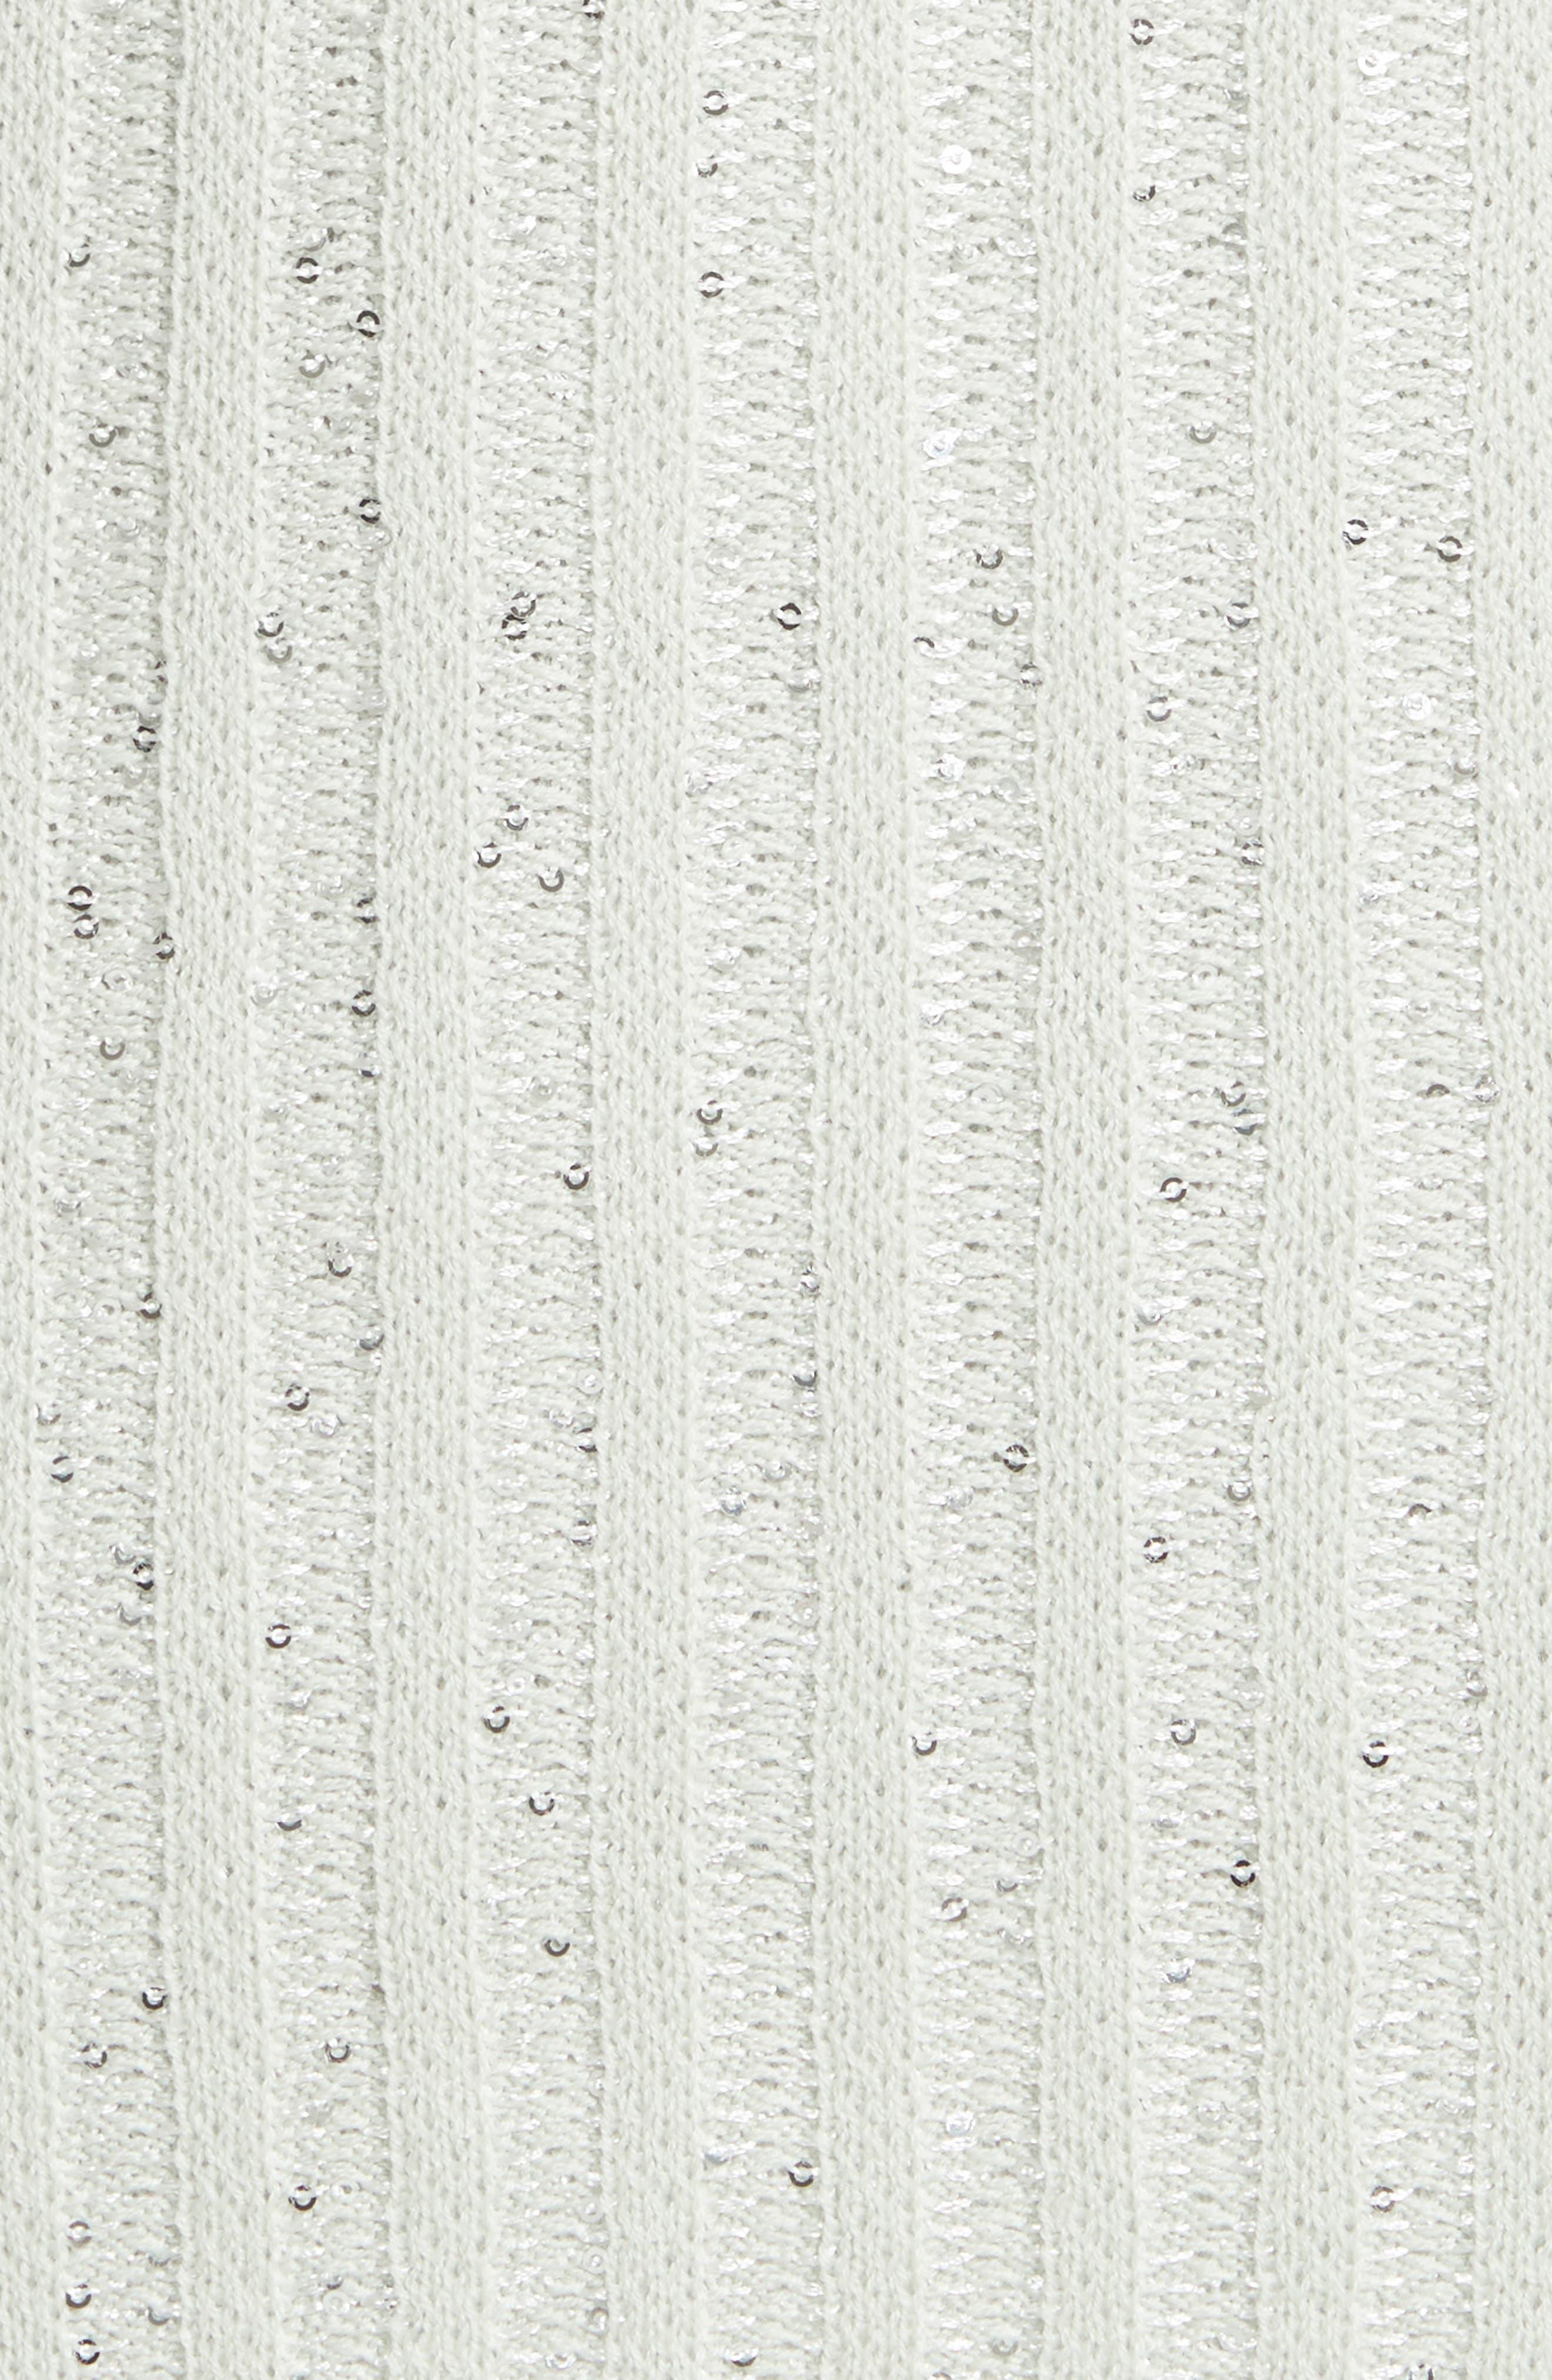 Sparkle Engineered Rib Sweater,                             Alternate thumbnail 5, color,                             050